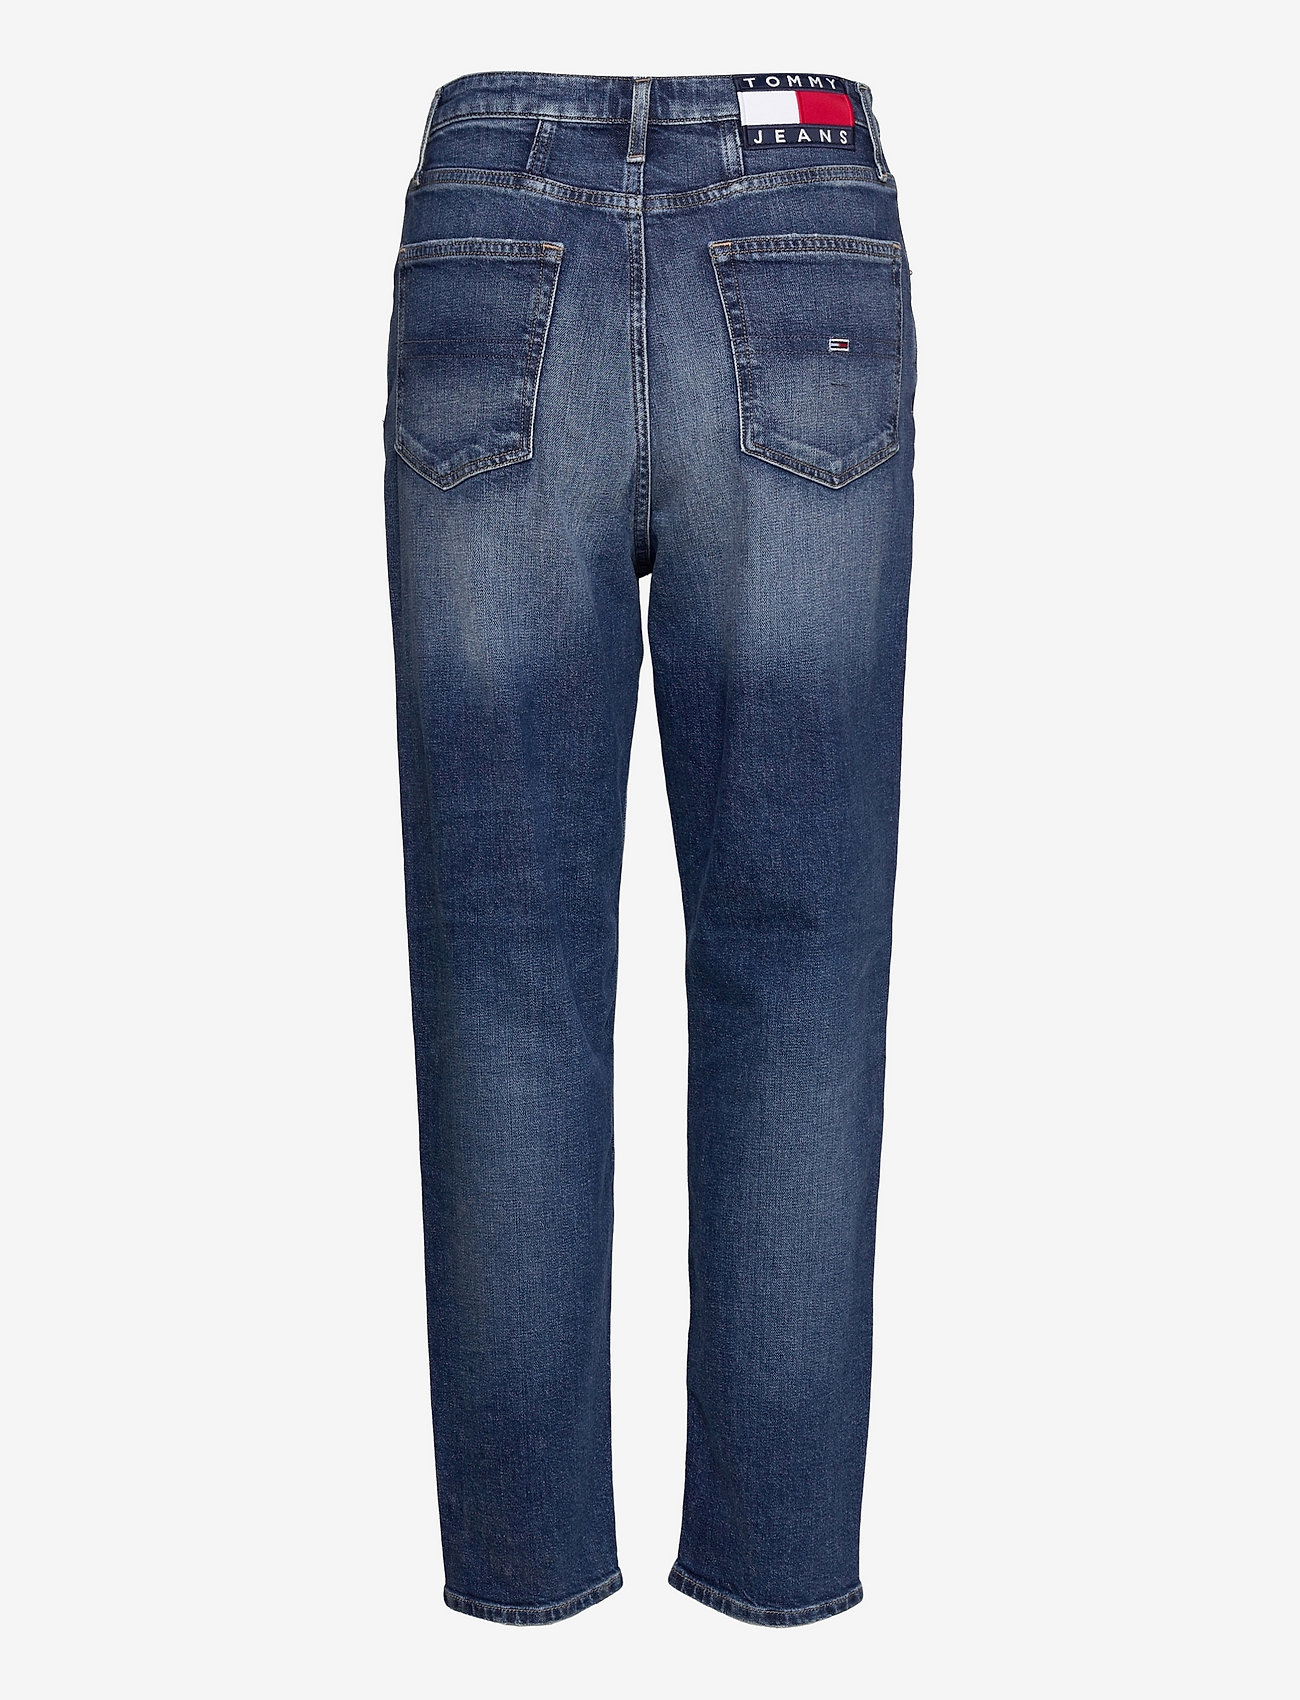 Tommy Jeans - MOM JEAN UHR TPRD AE632 MBC - tapered jeans - denim medium - 1